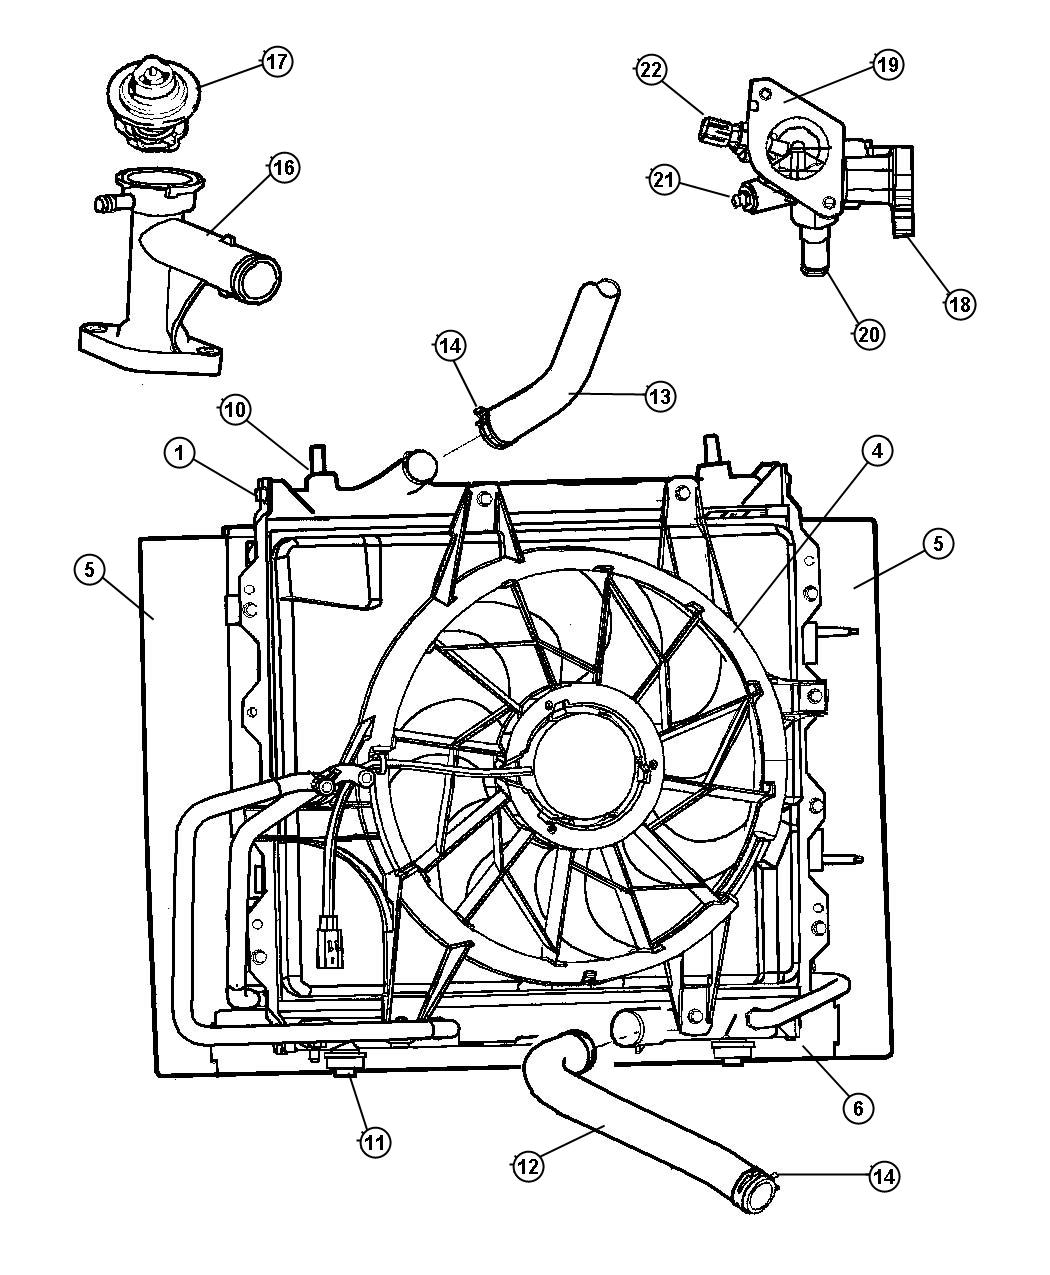 Chrysler 300 Connector Engine Coolant Outlet